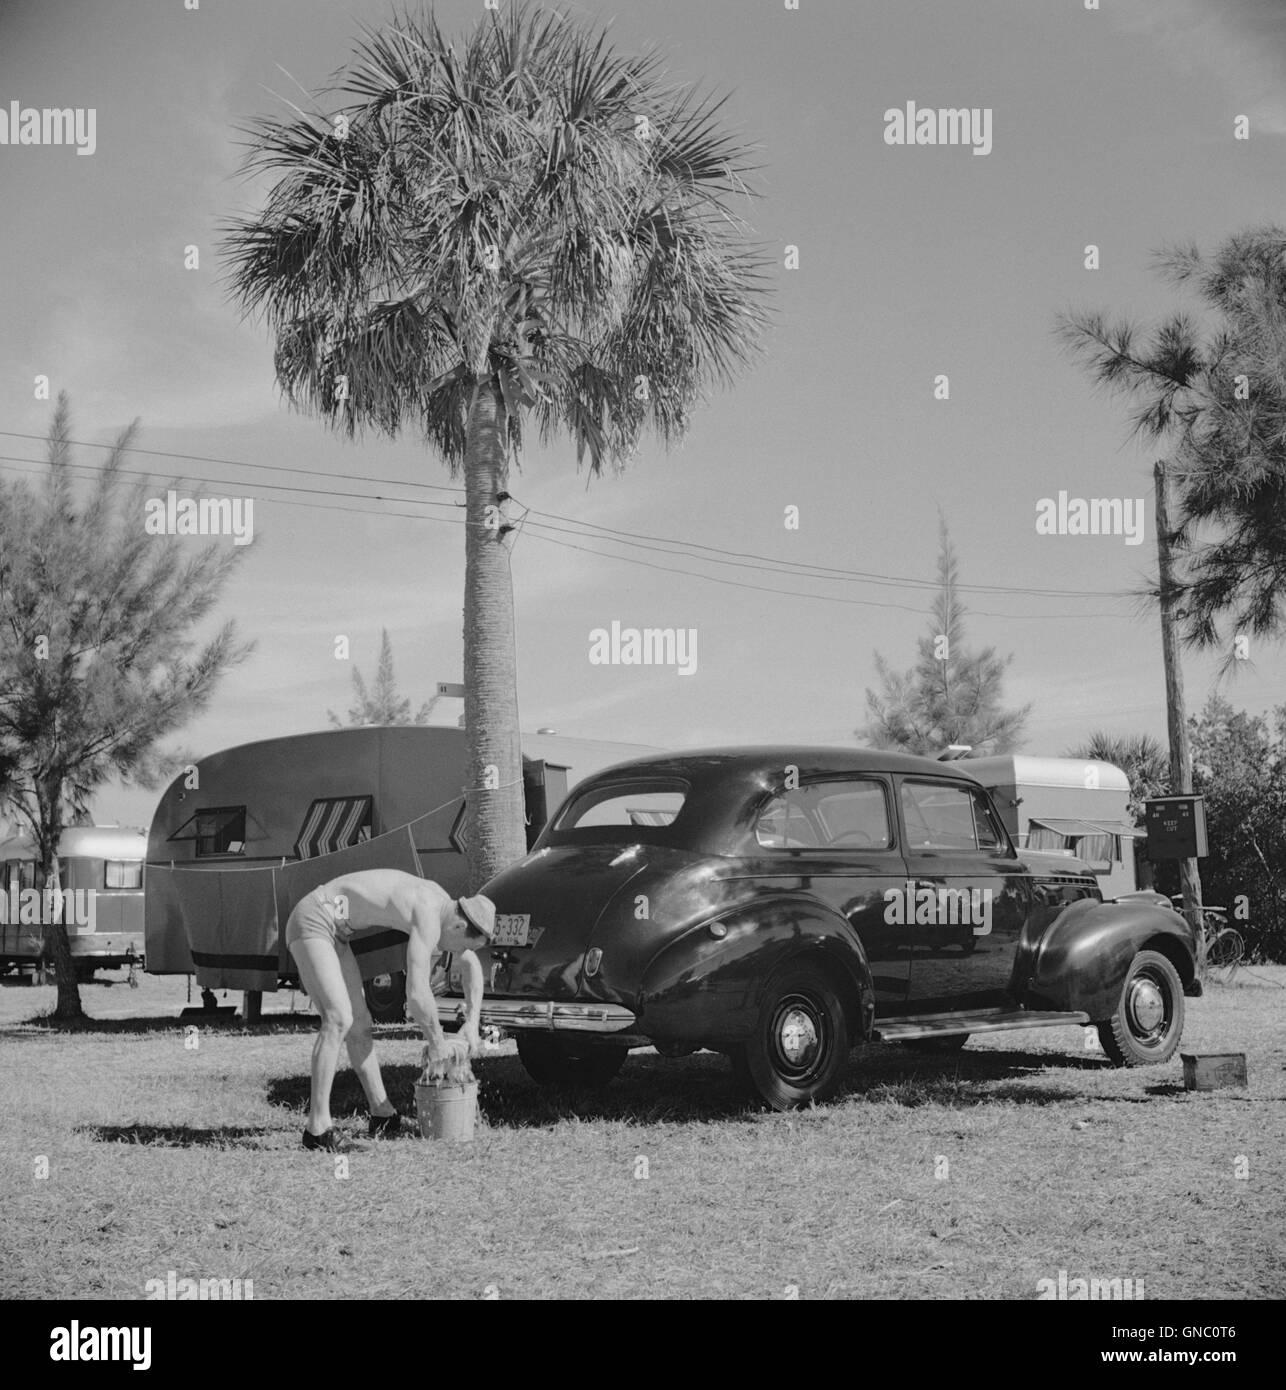 Man Washing Car at Trailer Park, Sarasota, Florida, USA, Marion Post Wolcott for Farm Security Administration, January Stock Photo